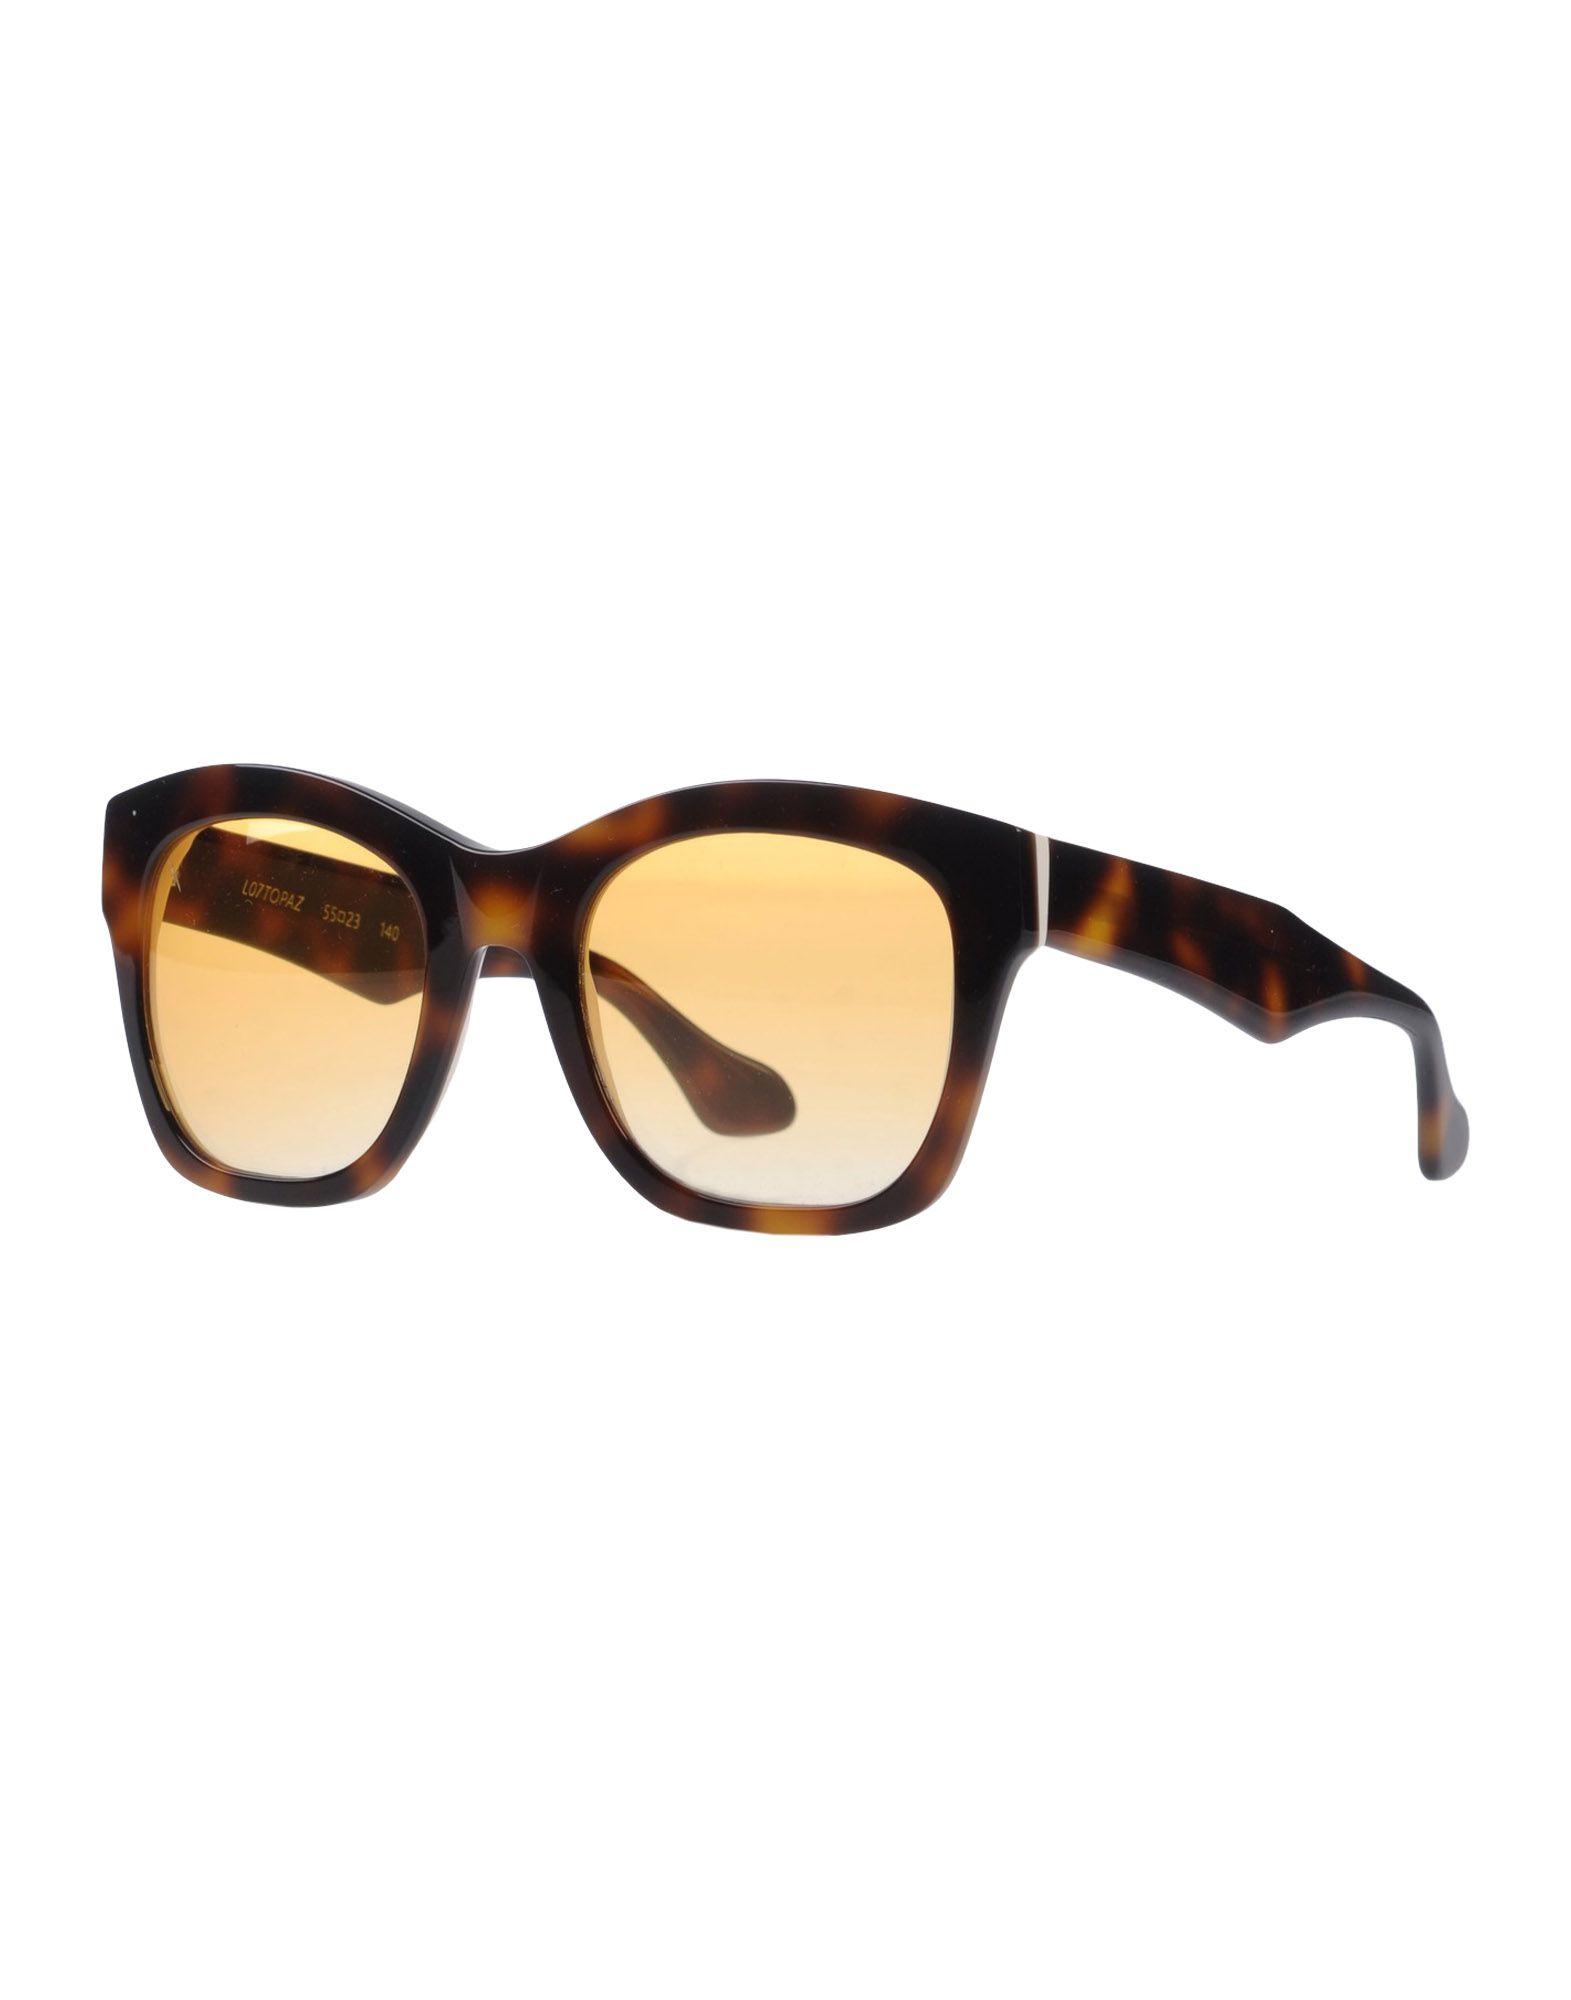 LEO Солнечные очки leo ventoni кошелек женский leo ventoni l330756 nero bianco